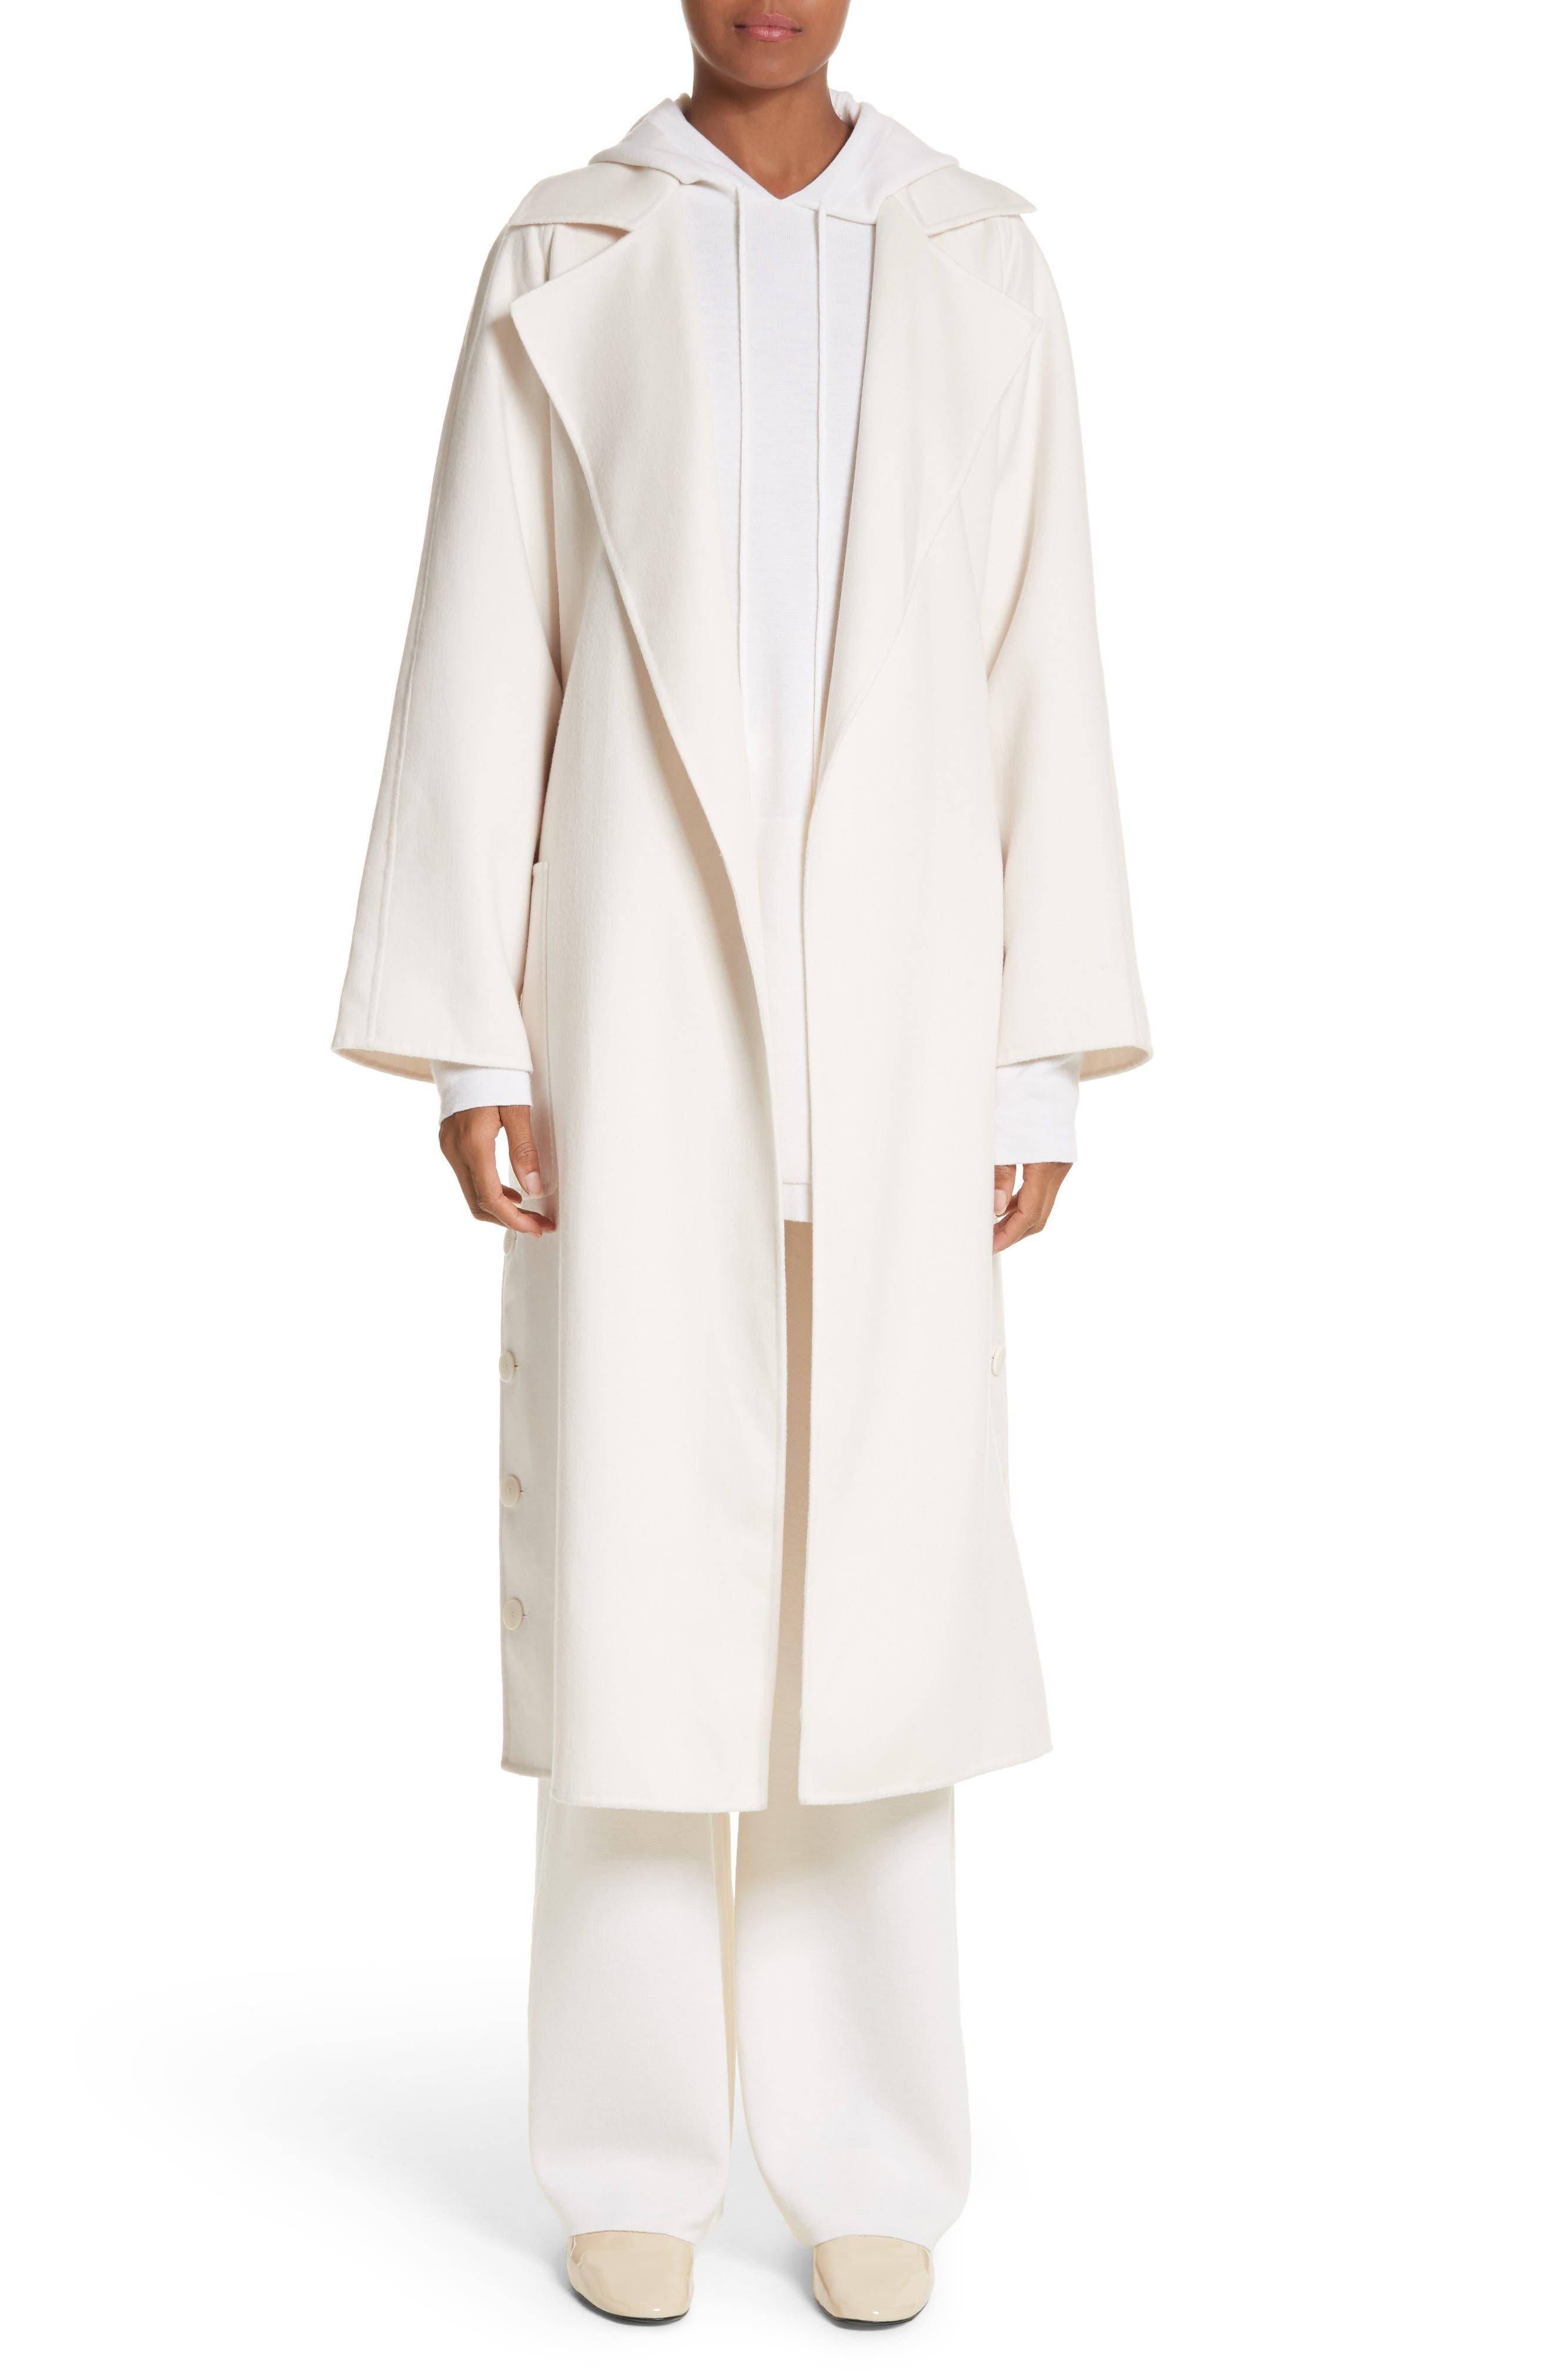 Alacre Wool & Cashmere Coat,                         Main,                         color, Silk